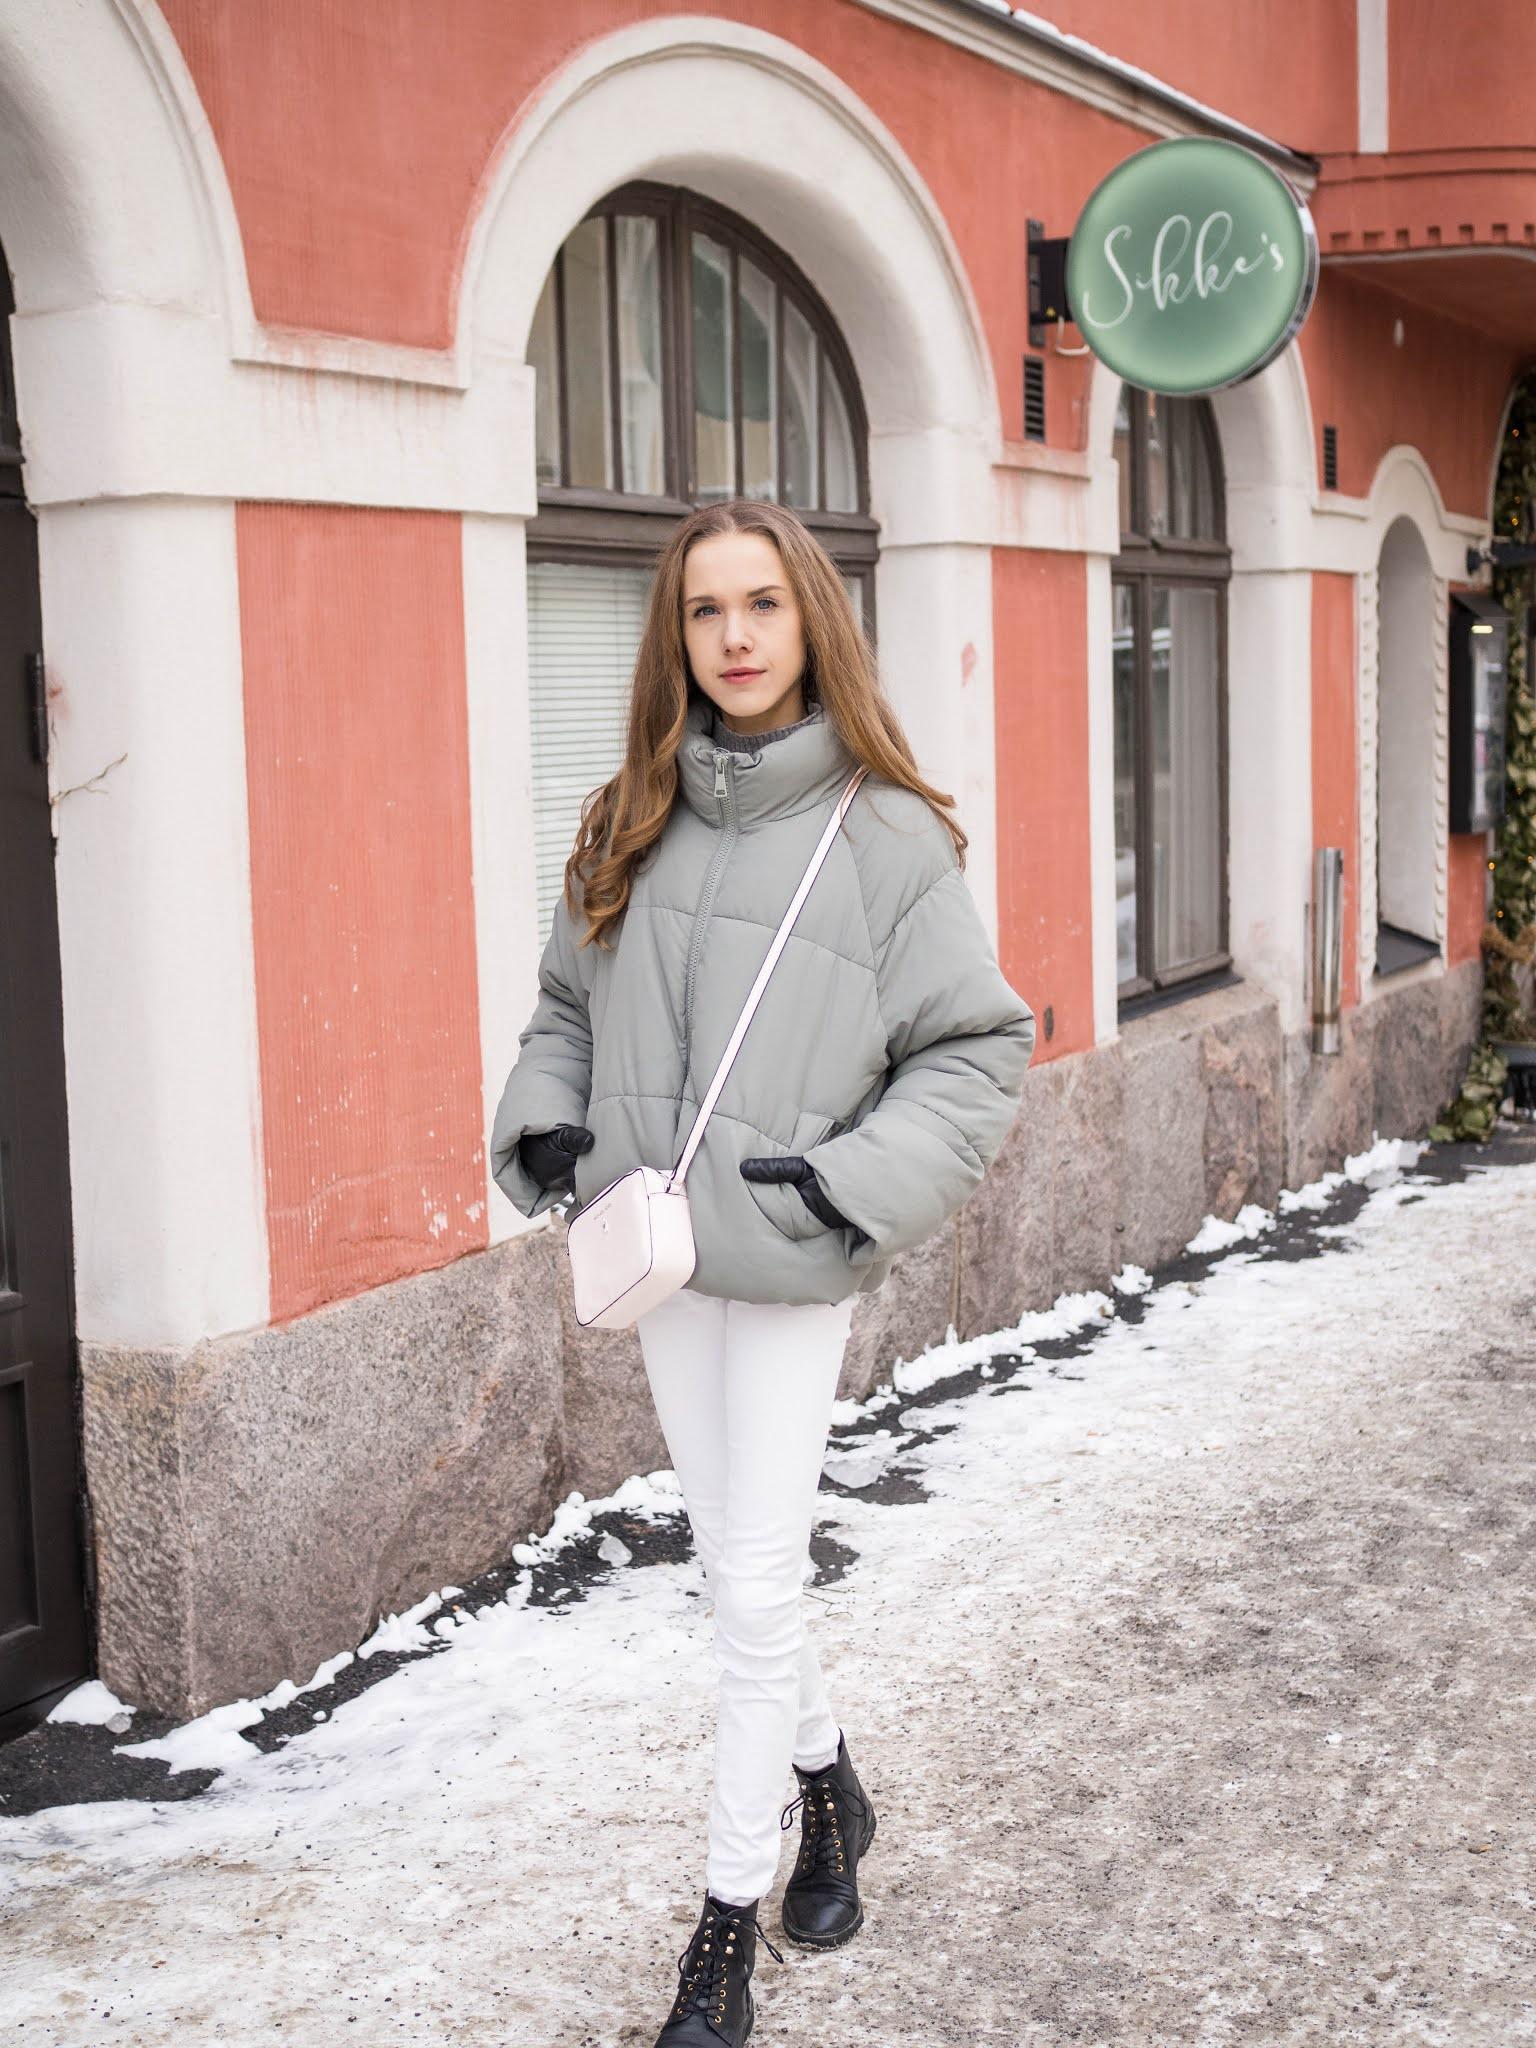 Kuinka pukeutua kevättalvella // Winter to spring transitional outfit inspiration